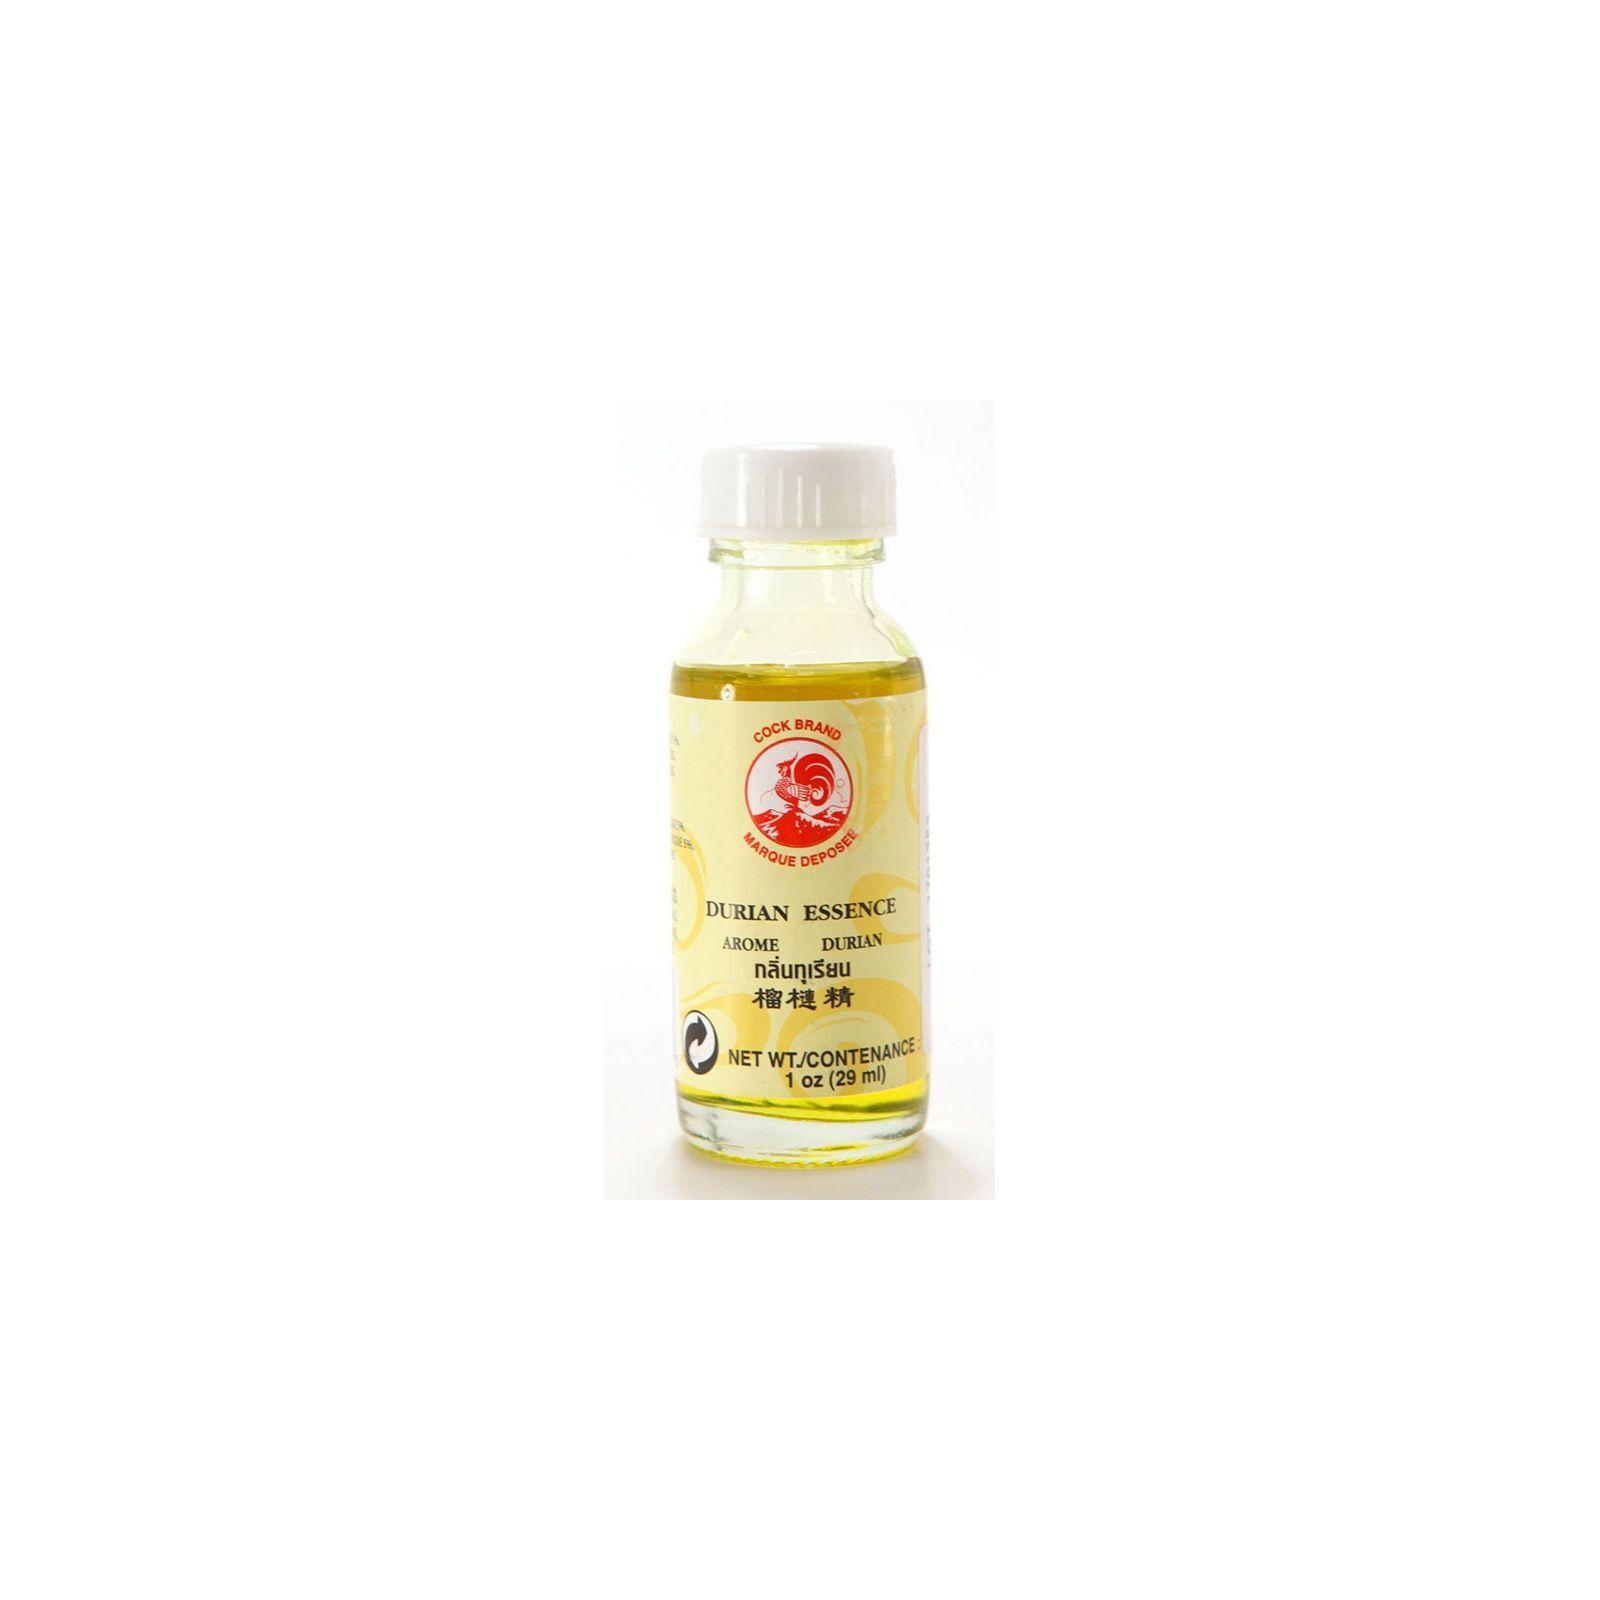 Asia Marché Arôme de Durian 29ml